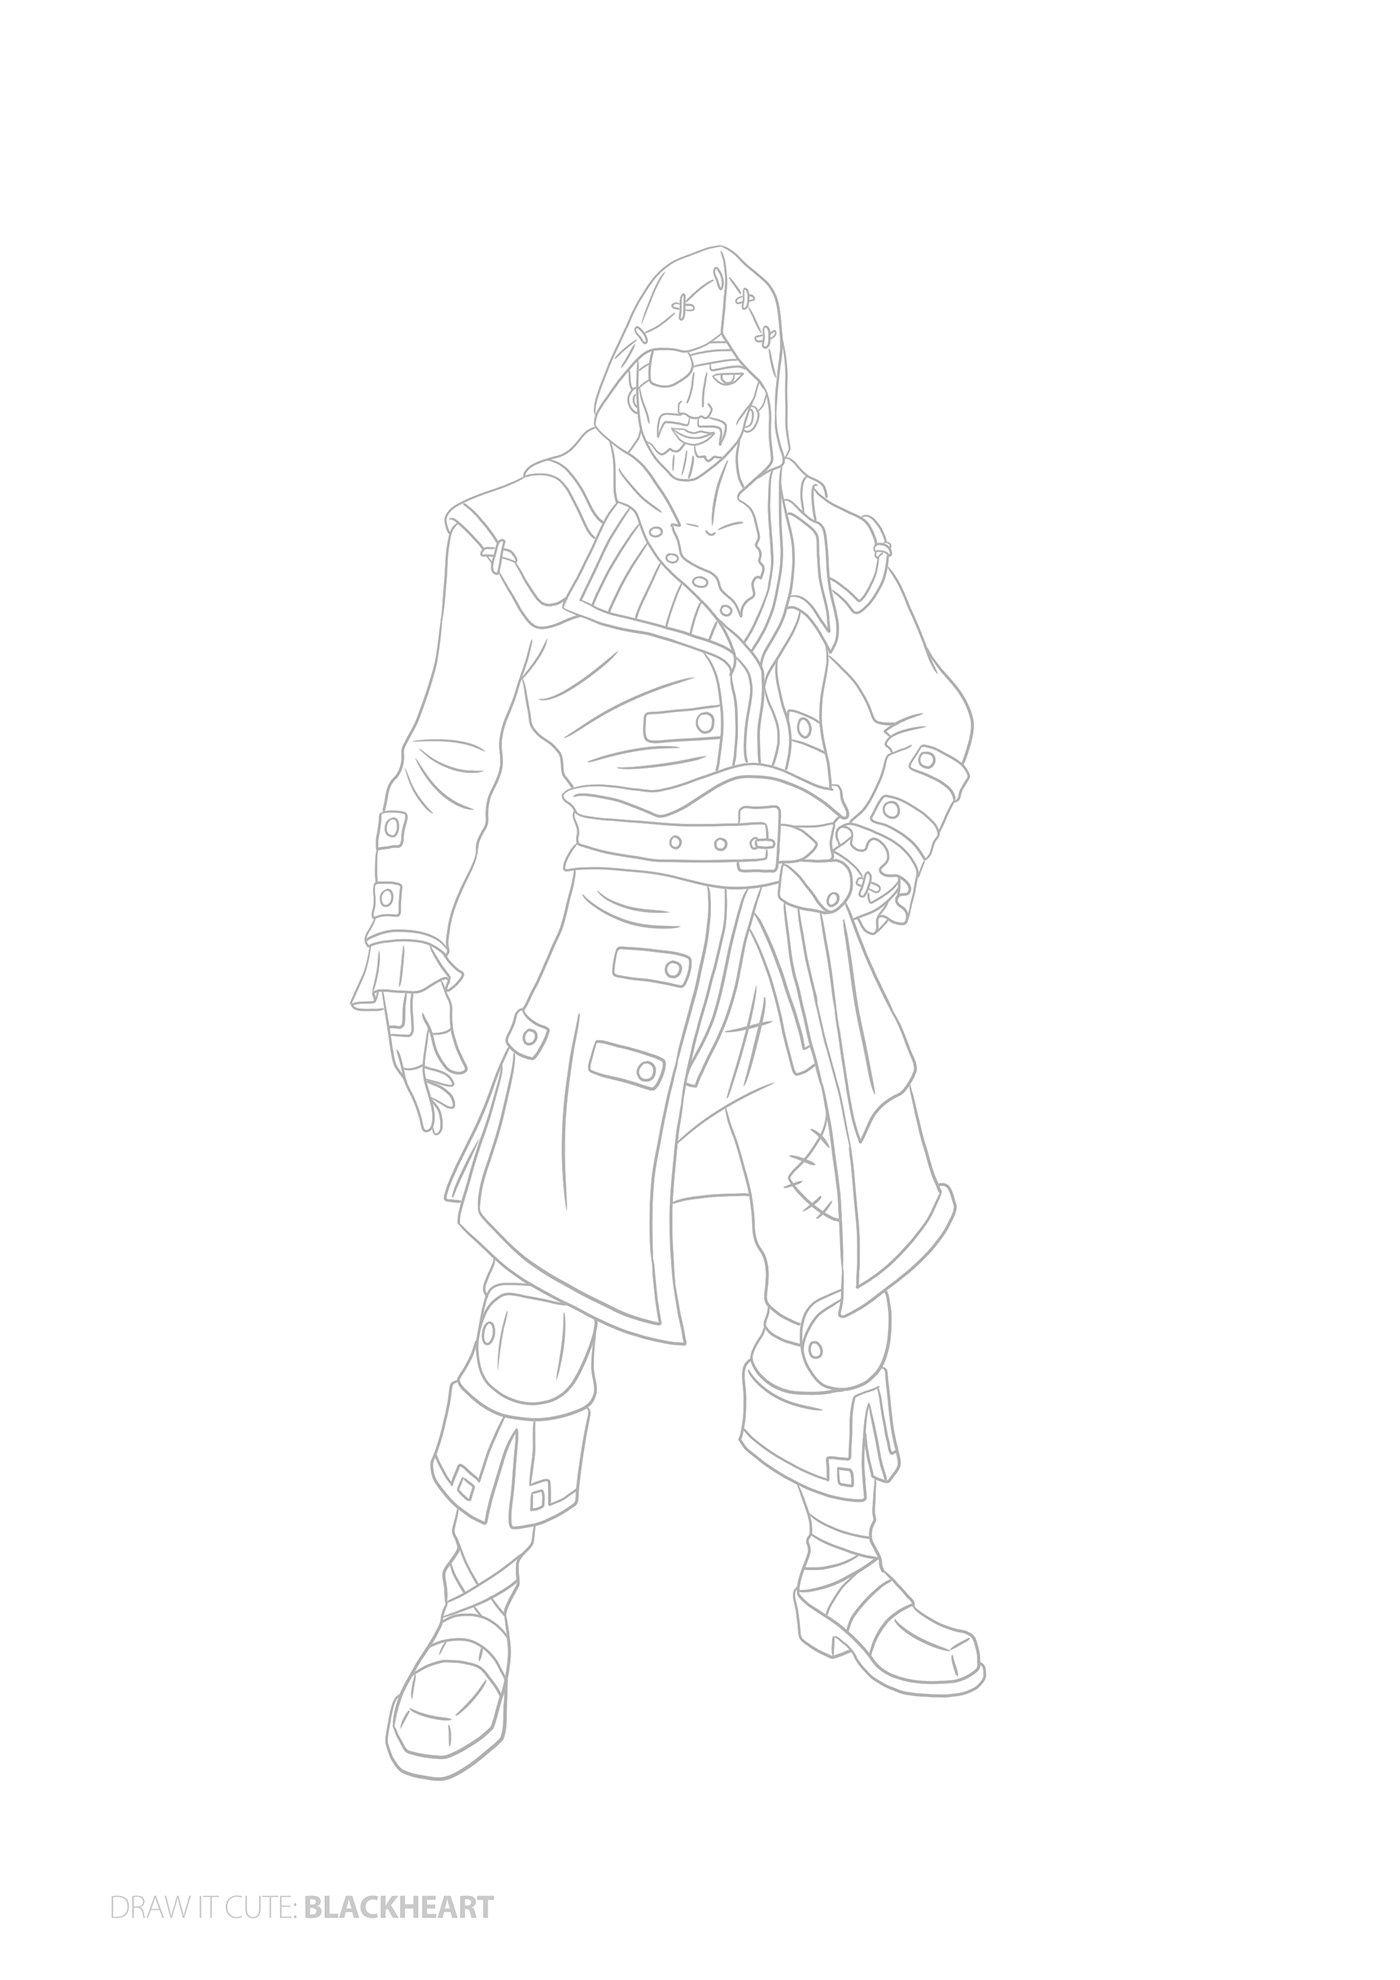 How To Draw Blackheart Easy Fortnite Season 8 Tut On Behance Dibujos Faciles Dibujos Fortnite Personajes